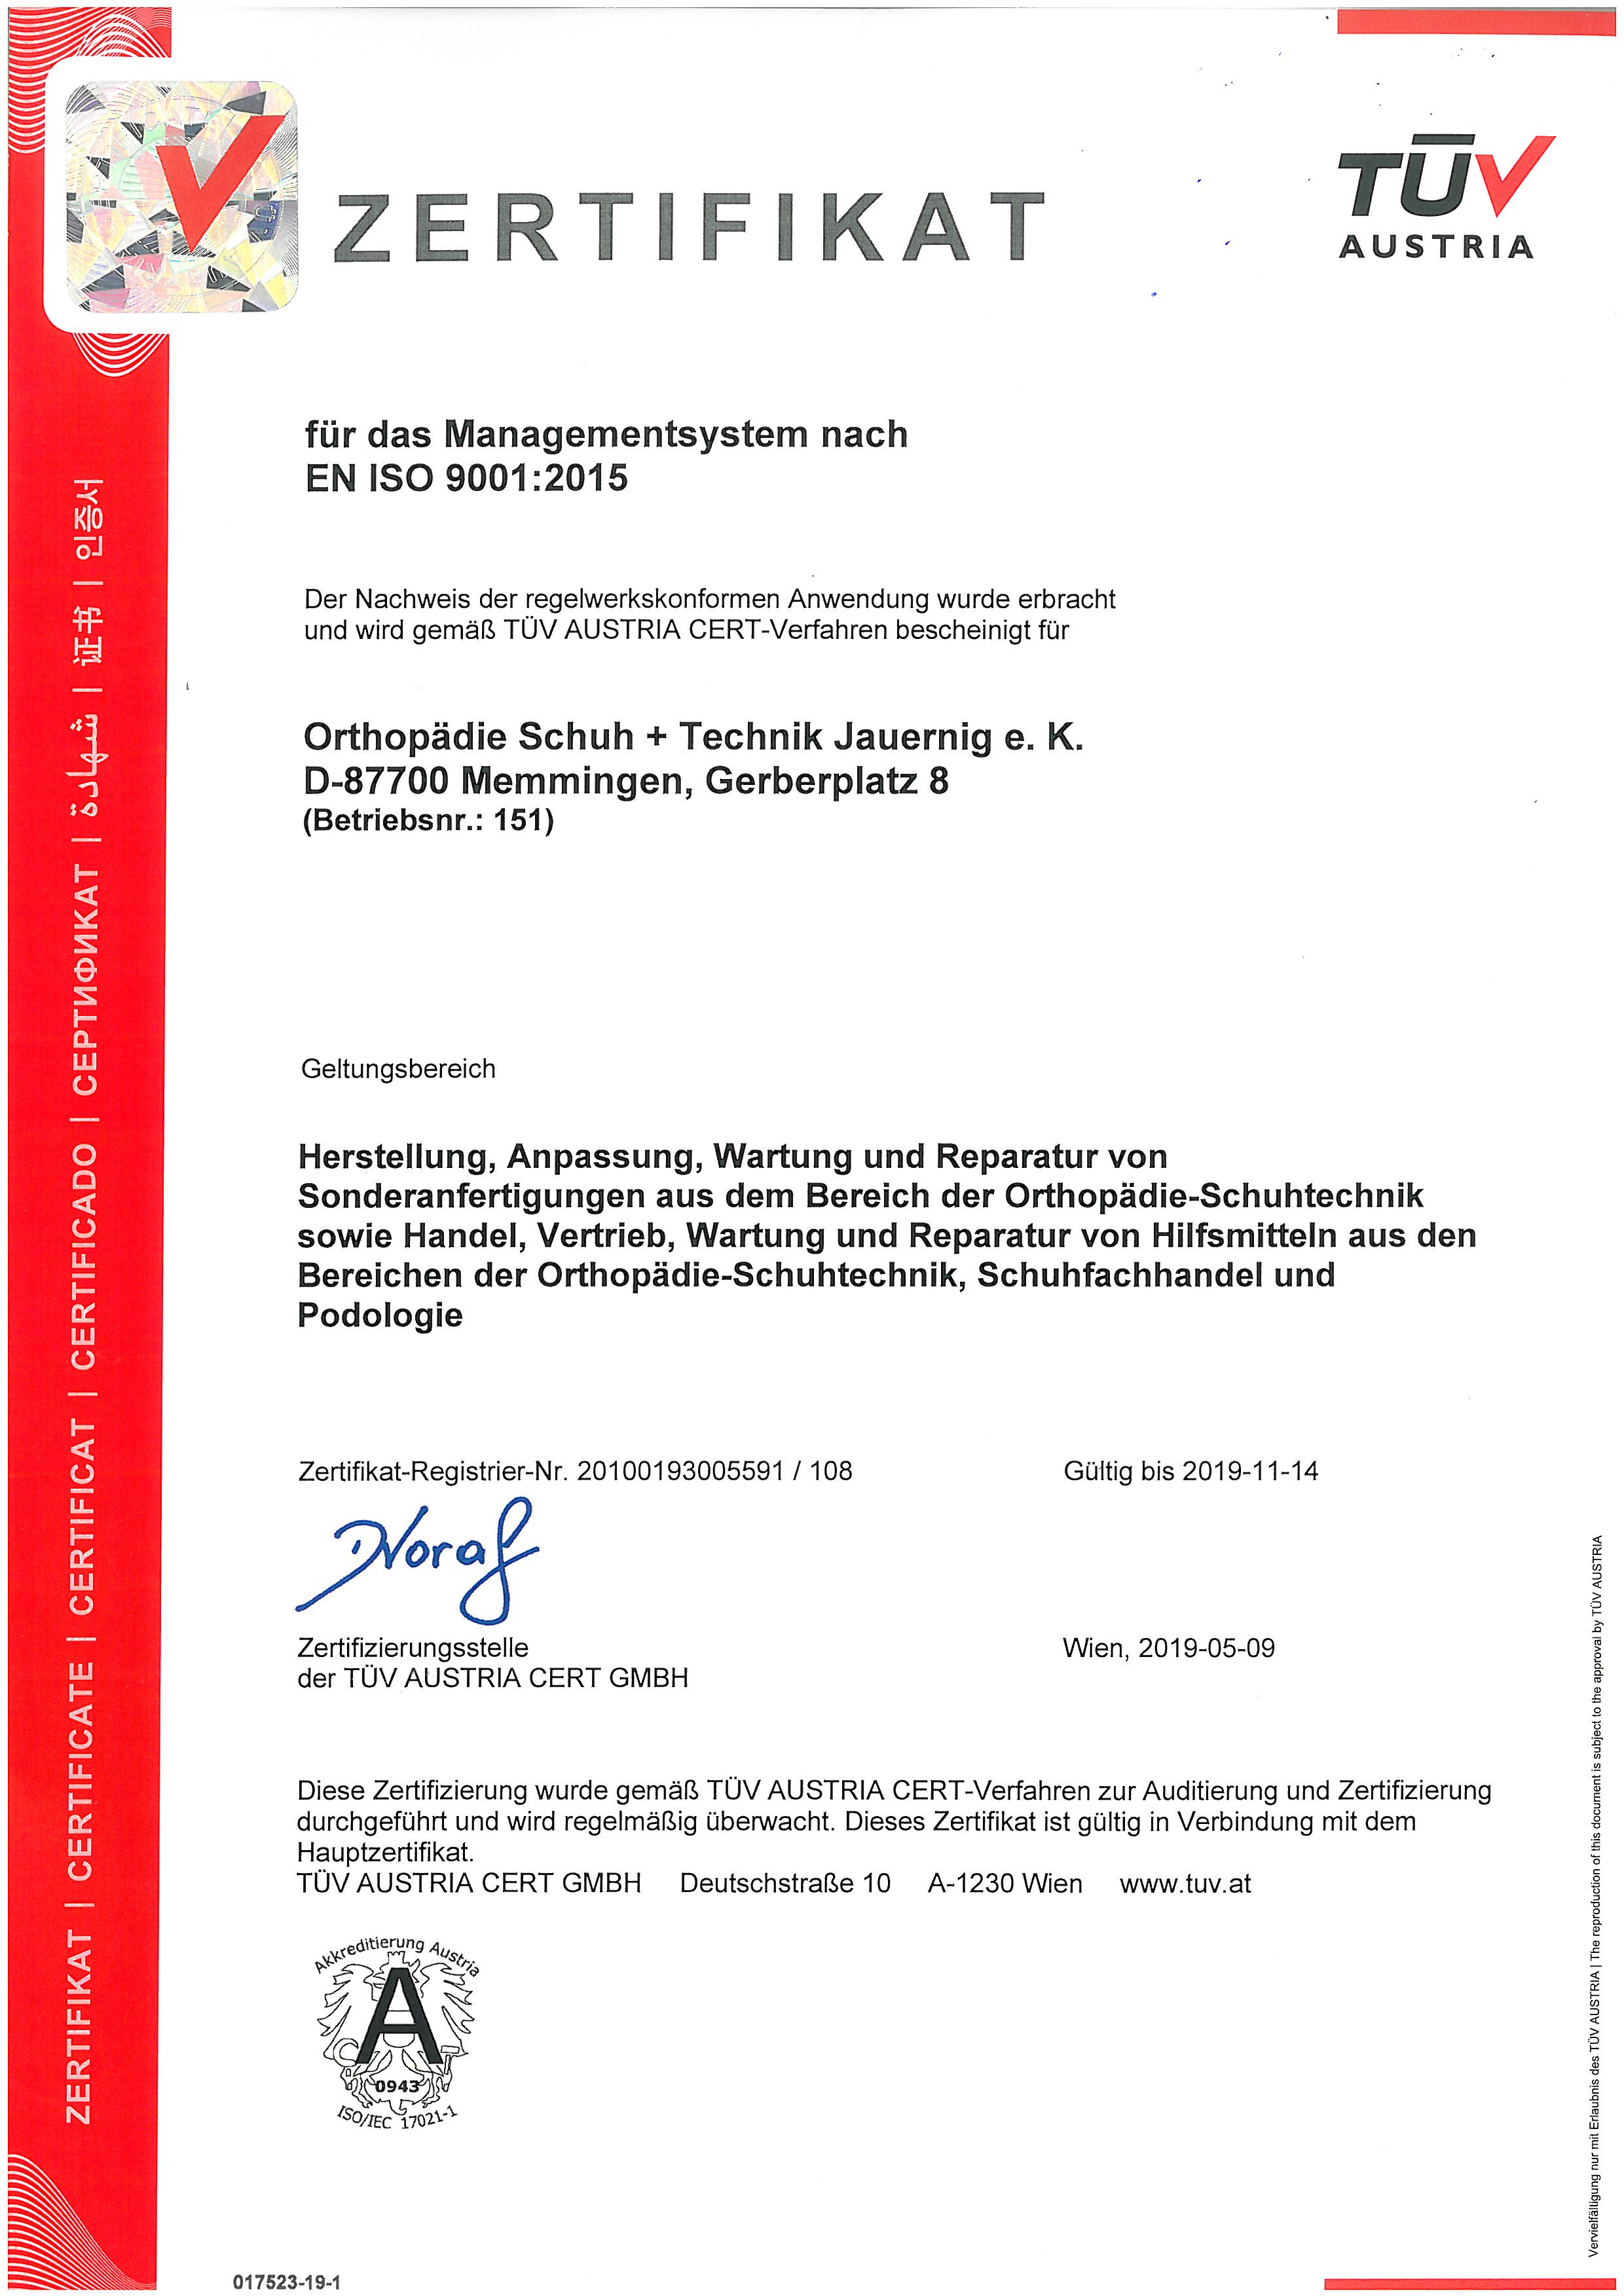 OM Zertifikat